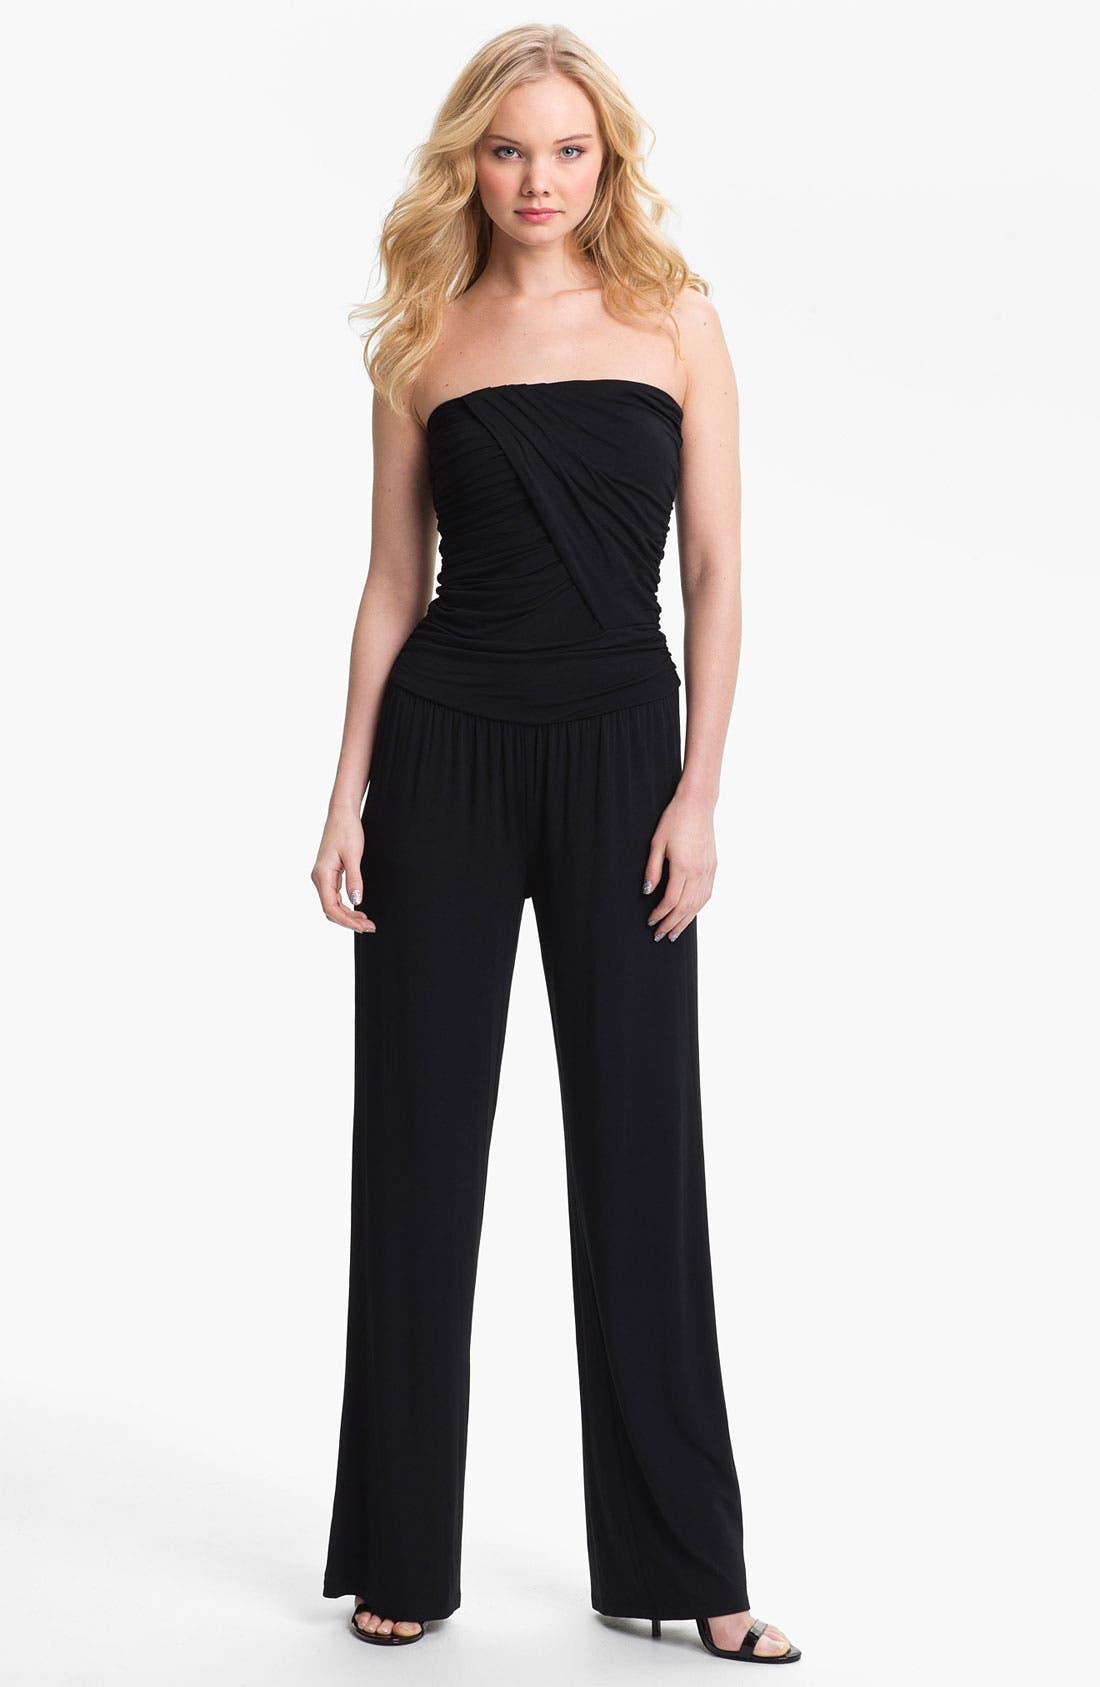 Main Image - Tart 'Mariah' Strapless Ruched Jumpsuit